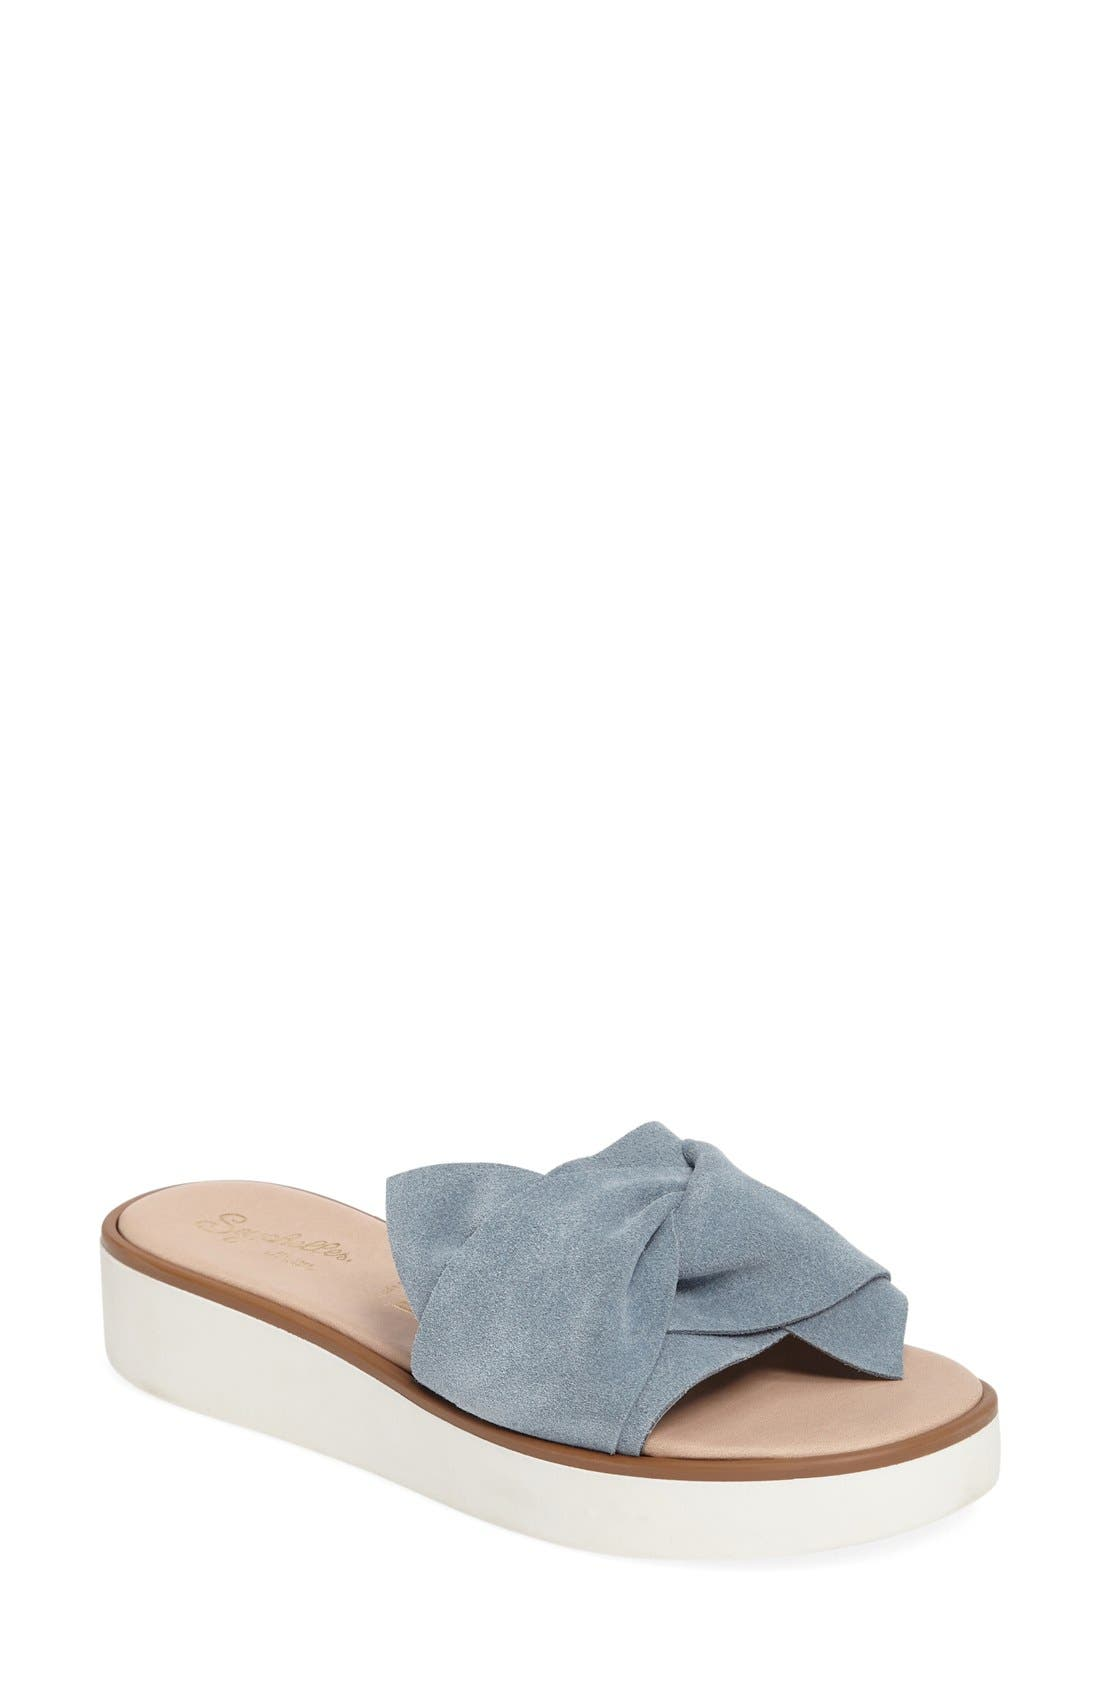 Coast Knotted Slide Sandal,                         Main,                         color, Blue Suede